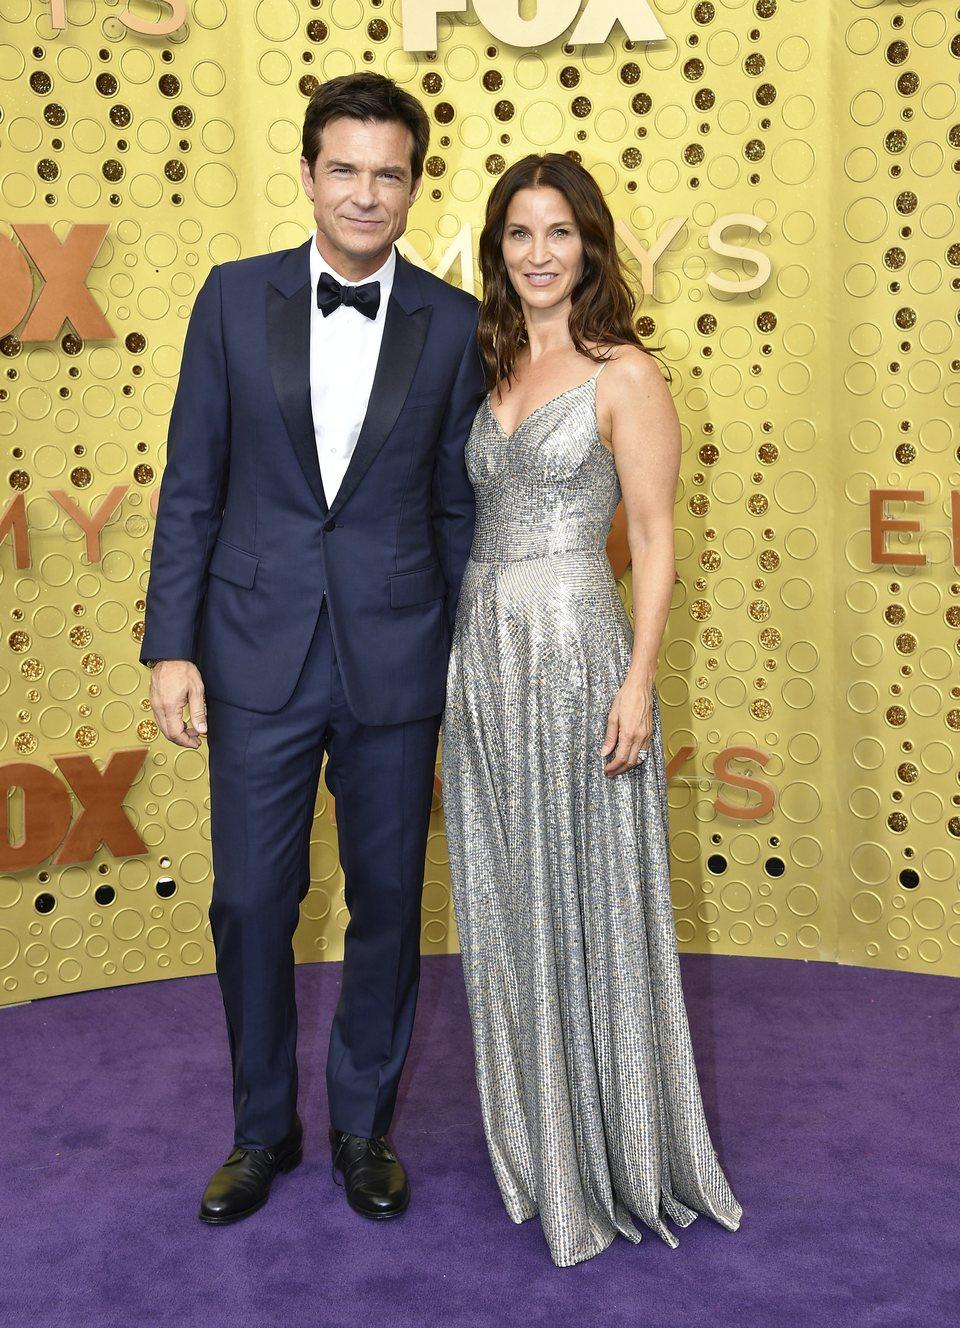 Jason Bateman at the Emmy 2019 red carpet